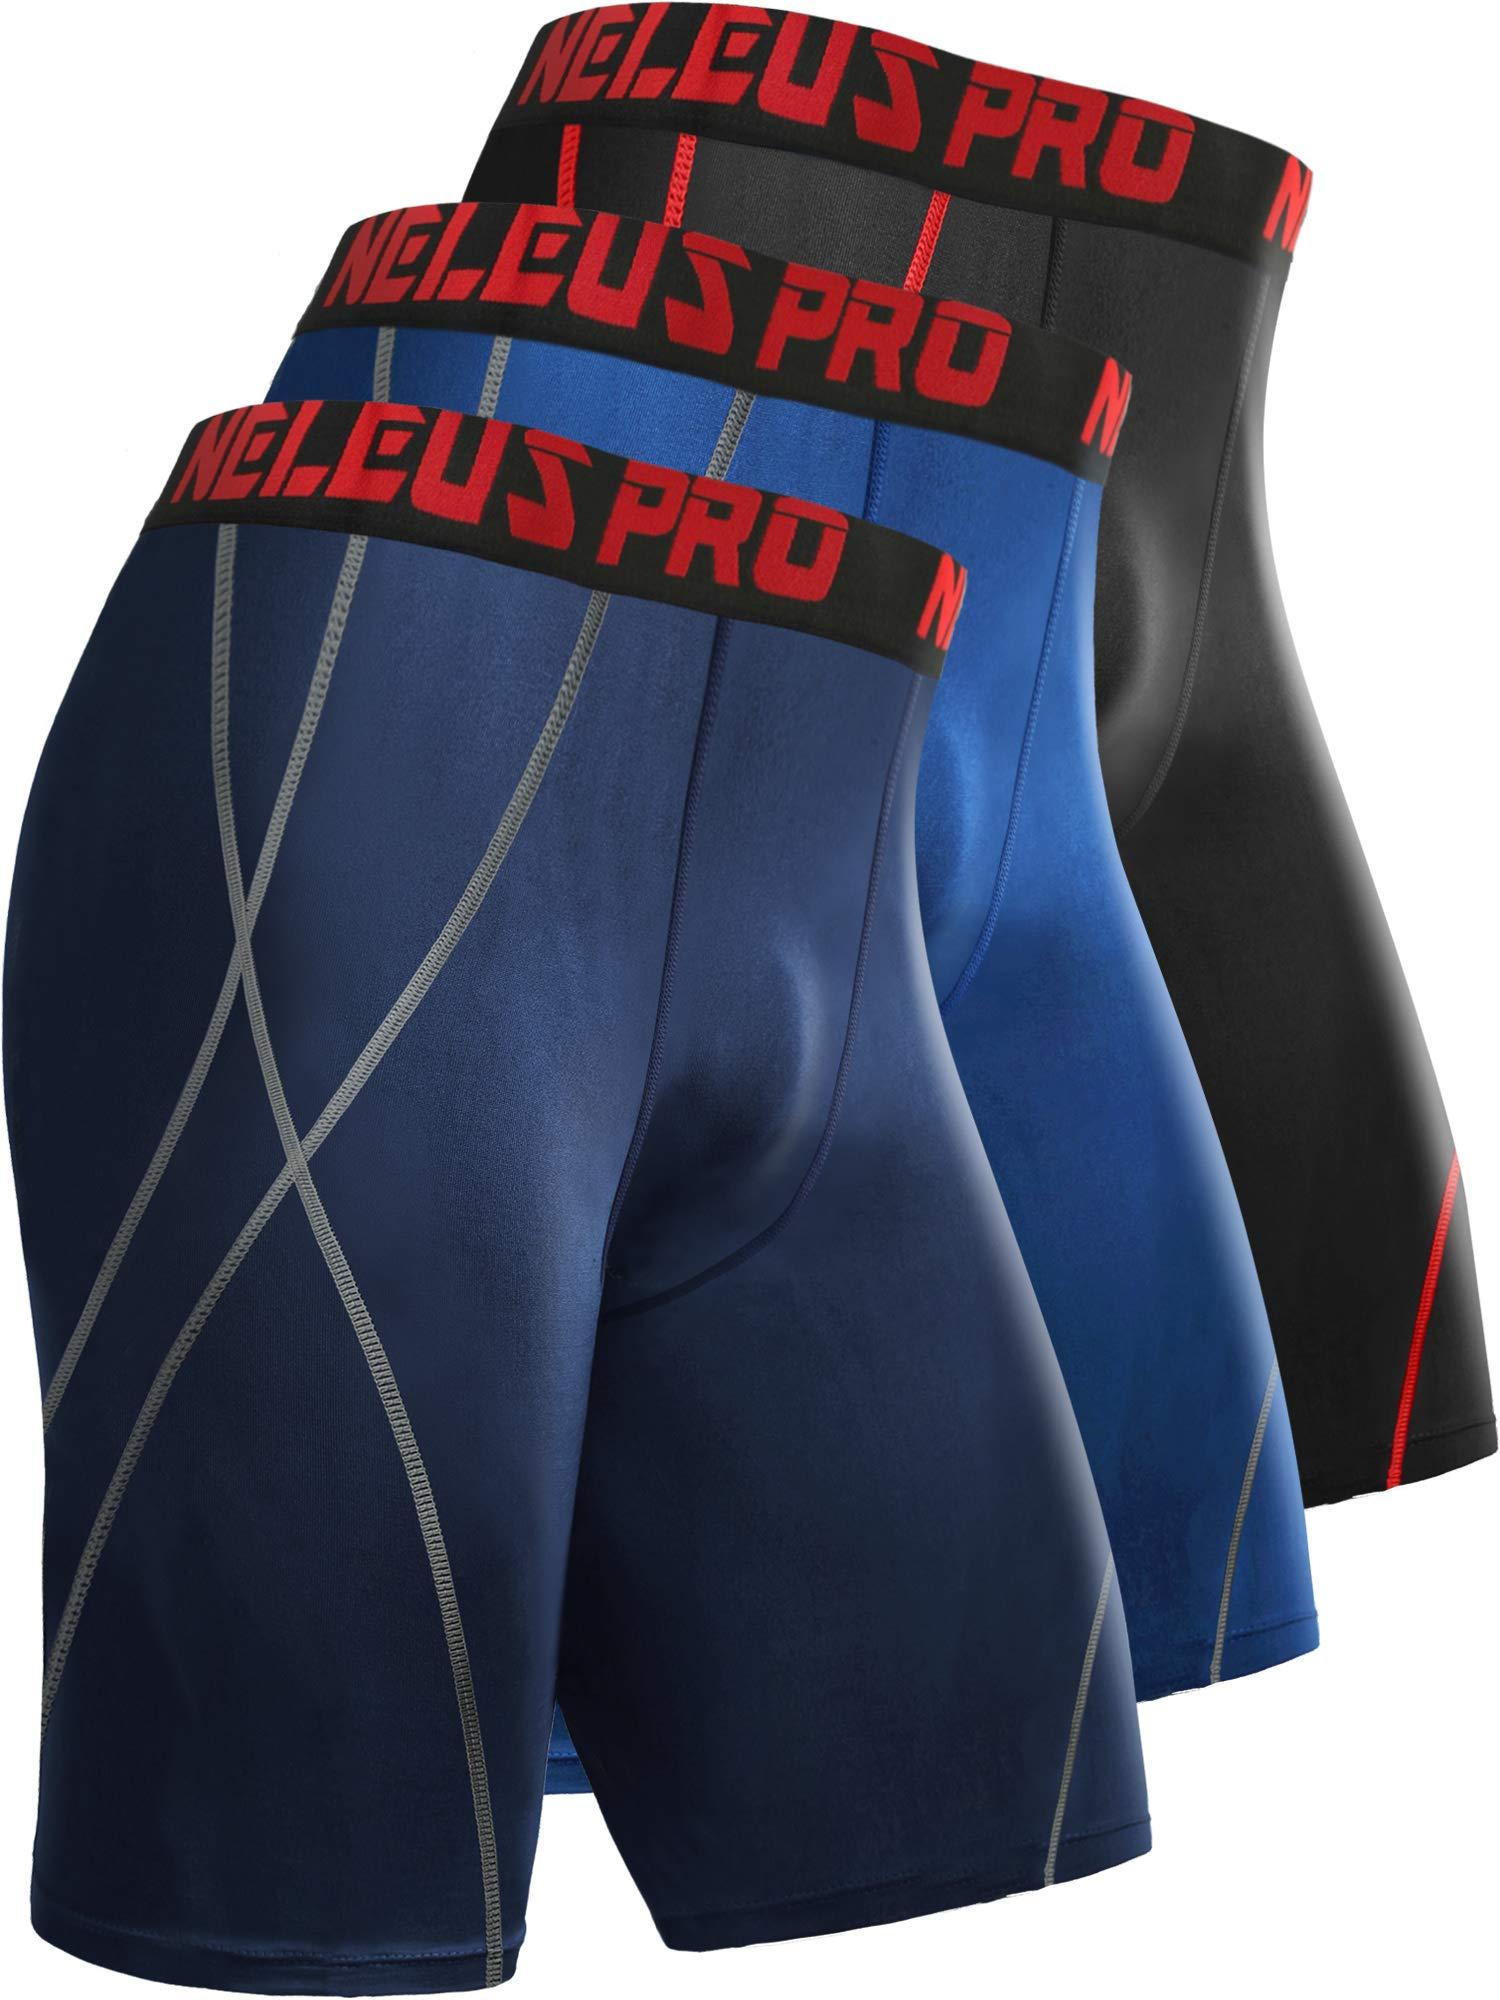 Neleus Men's 8 inch Compression Shorts,6010,3 Pack:Black,Blue,Navy Blue,XL,EU 2XL by Neleus